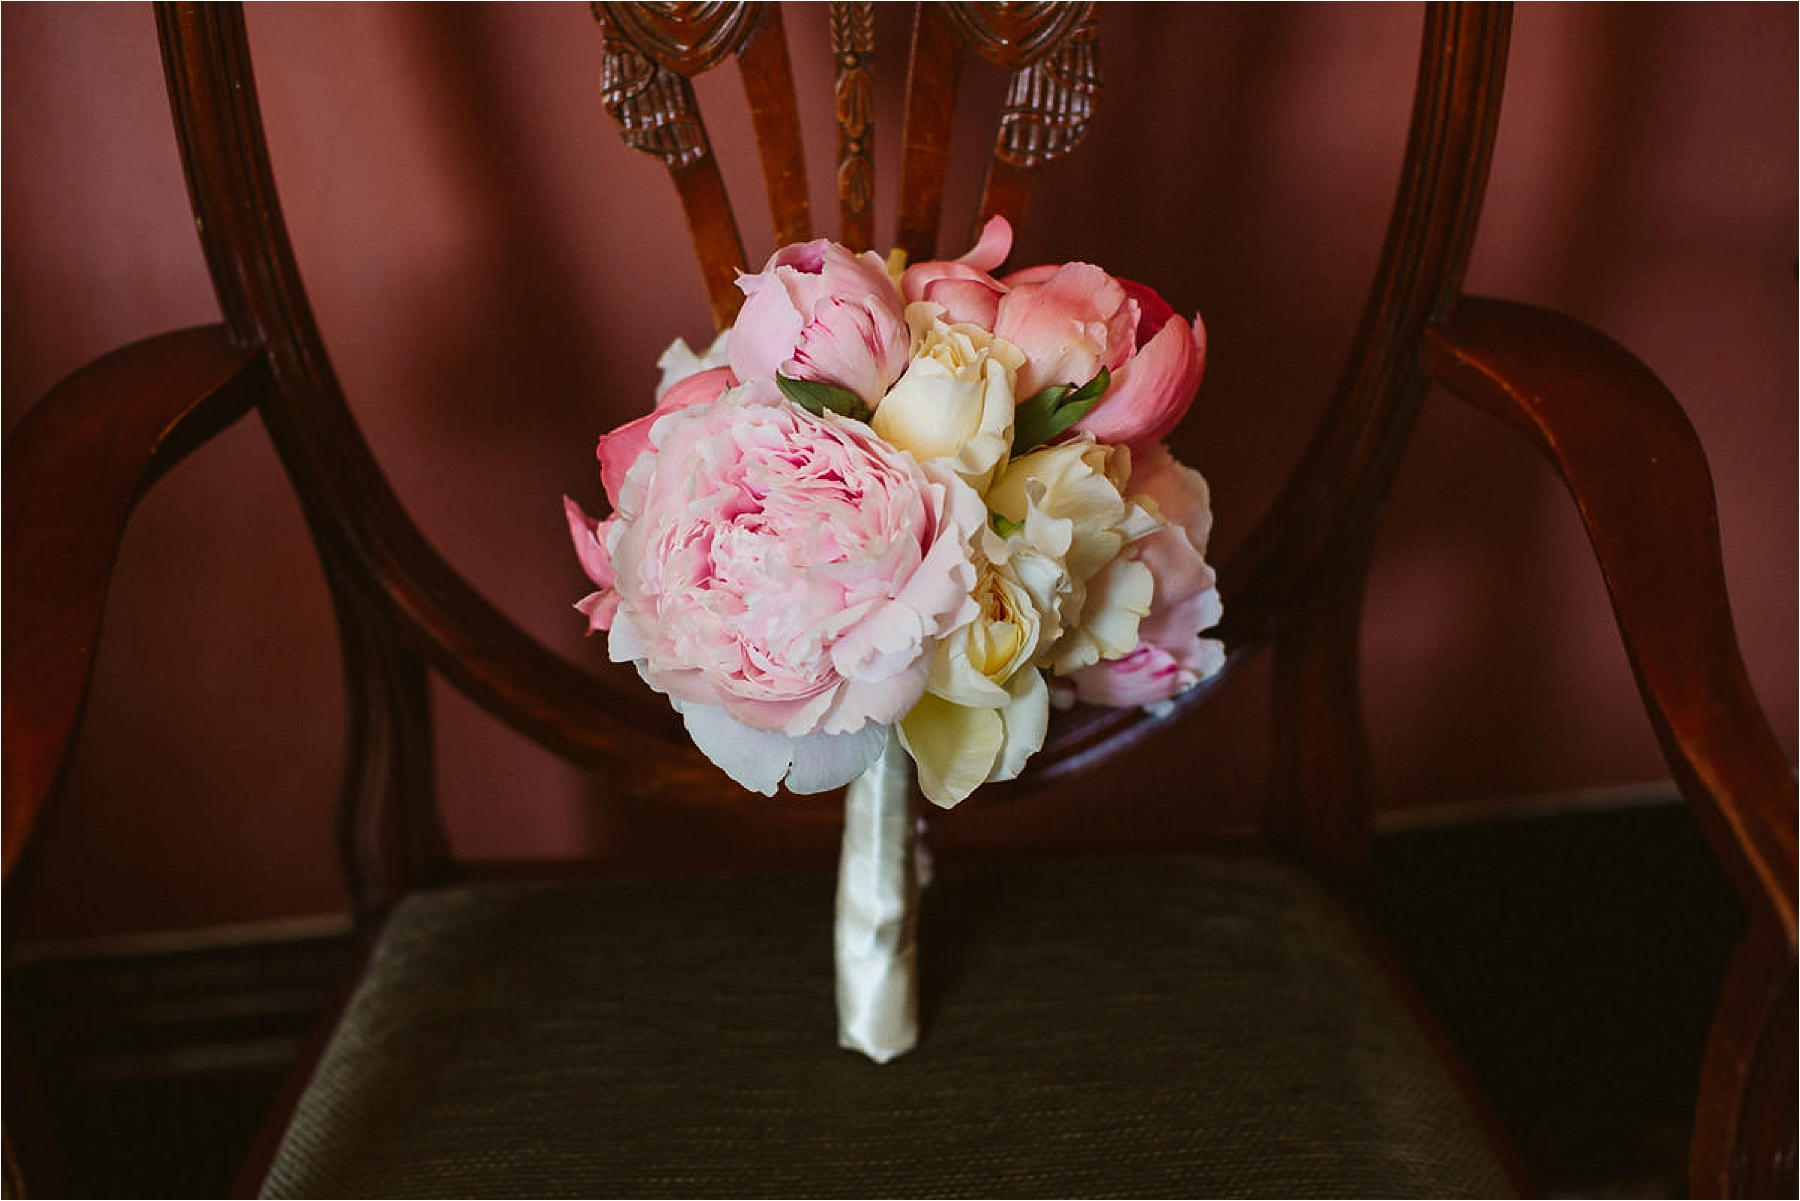 bridal flowers from kensington and chelsea register office wedding